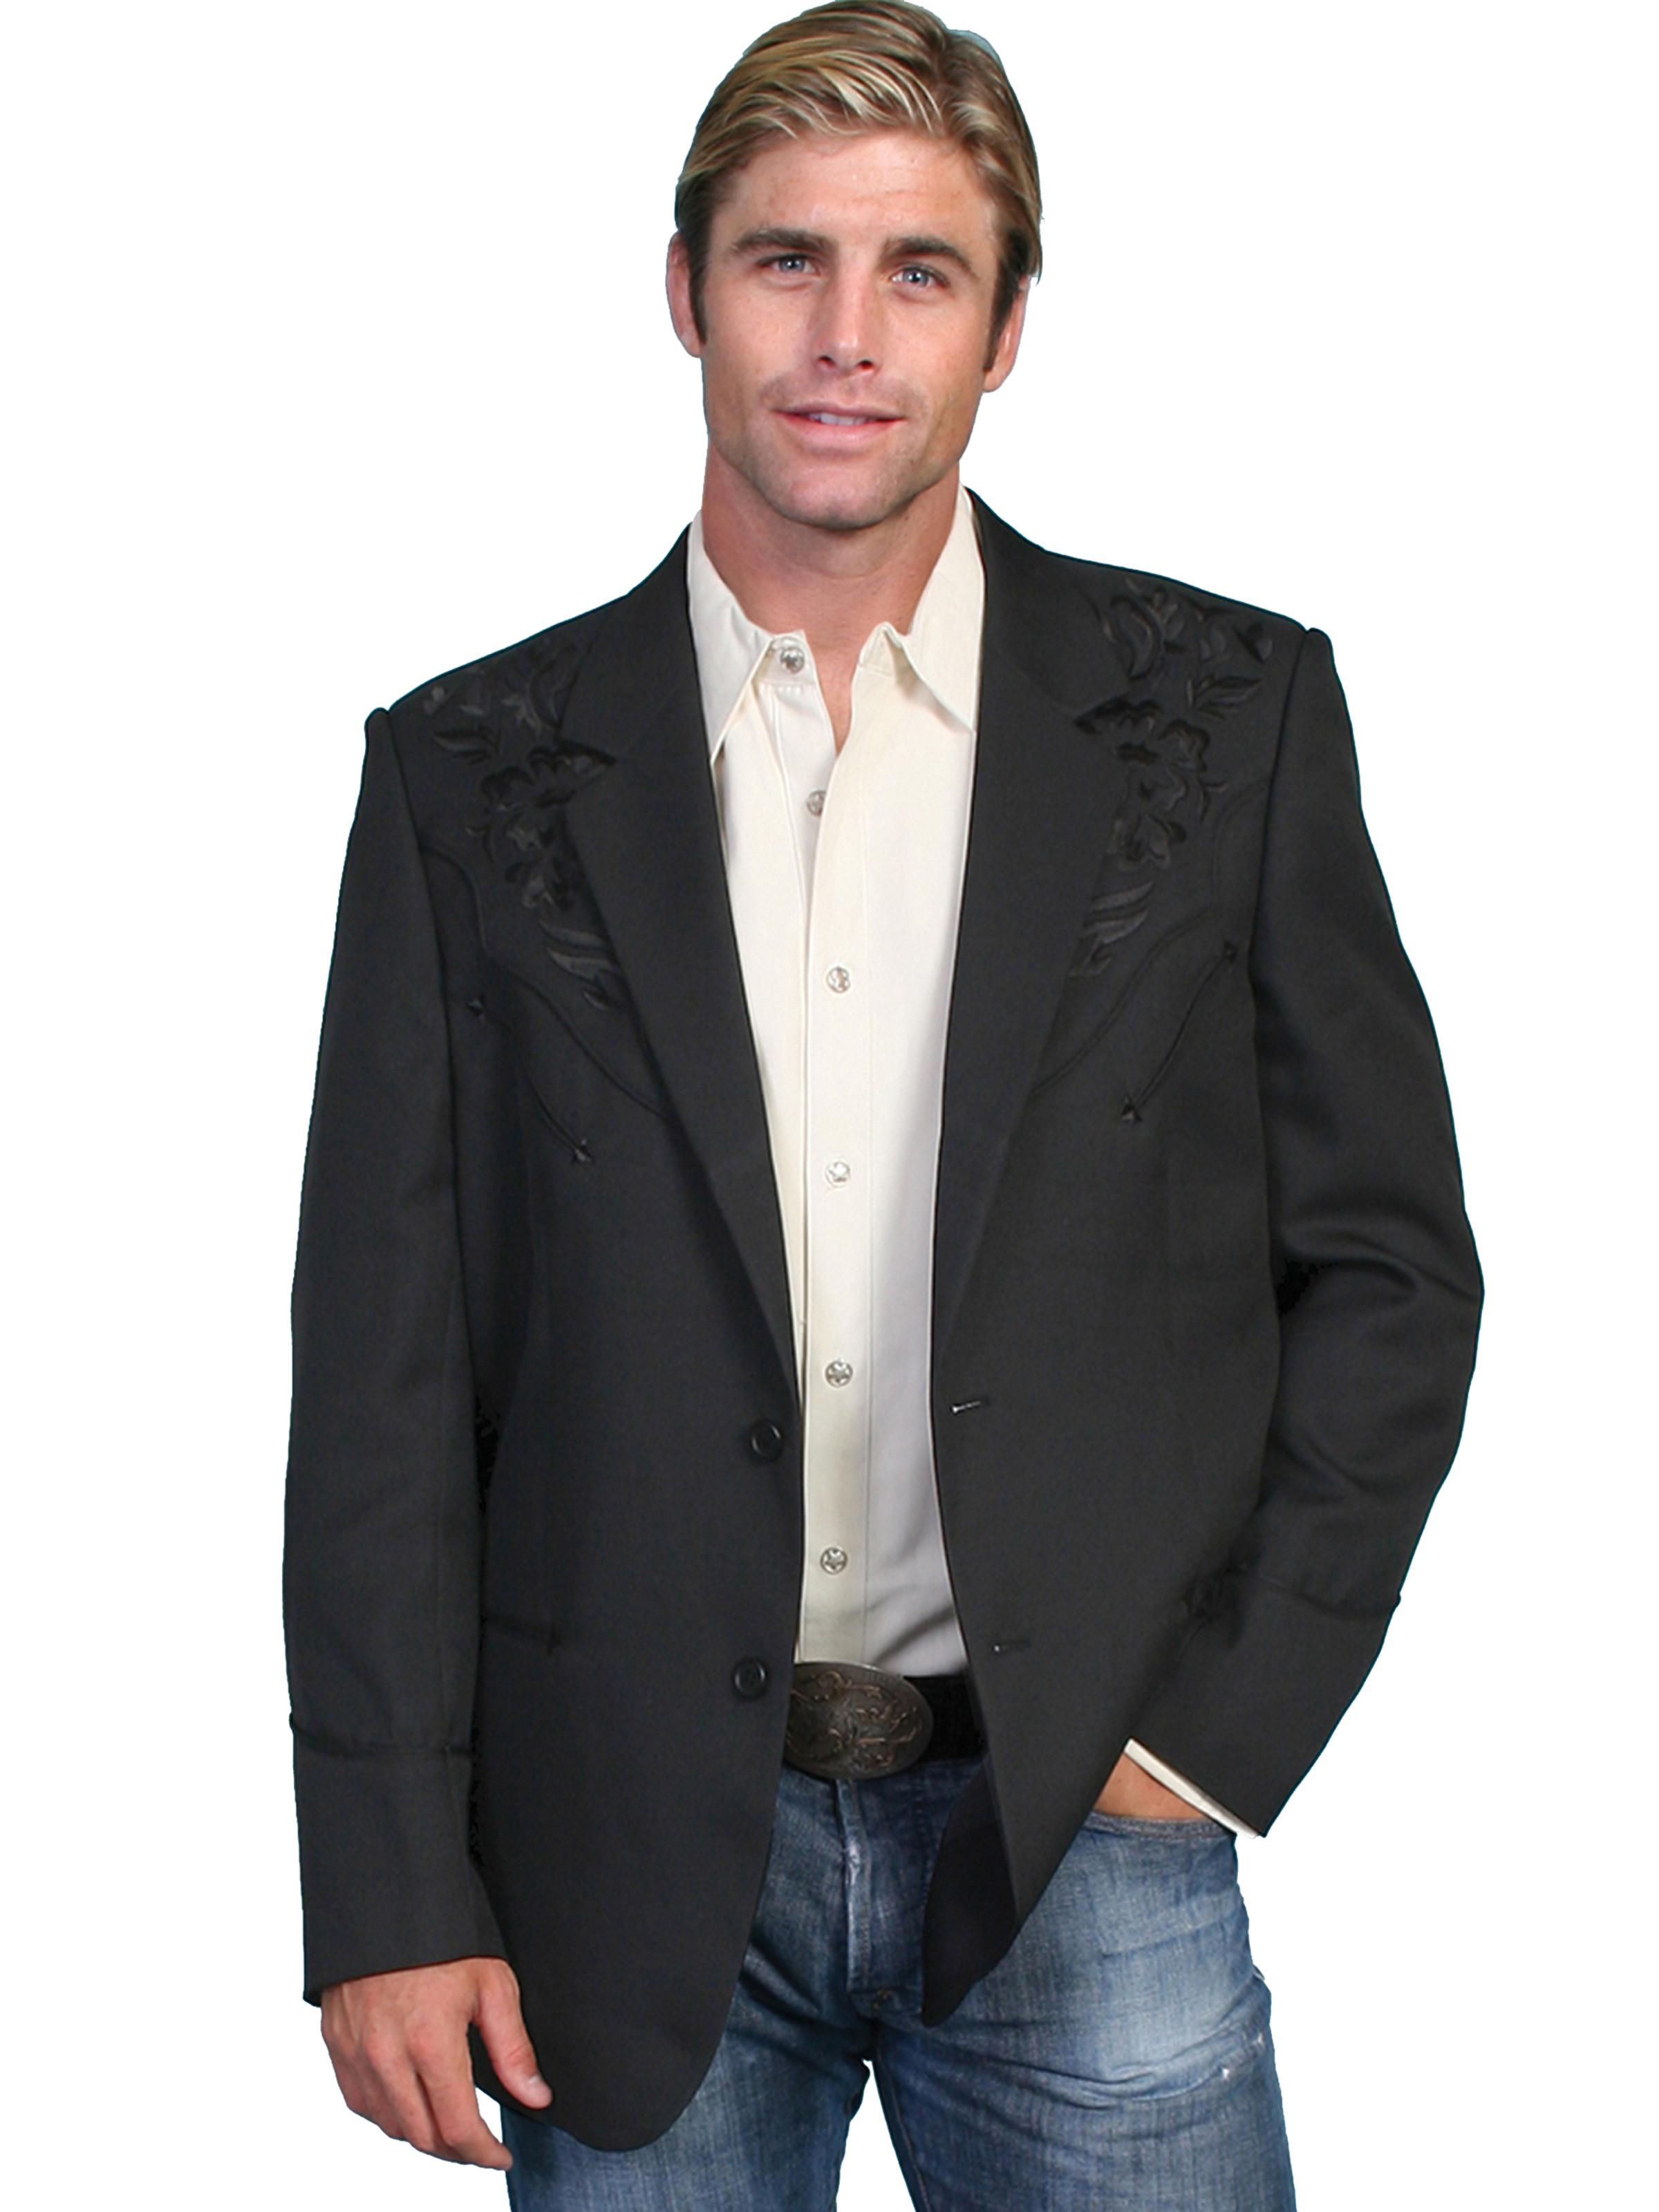 Cowboy Jackets